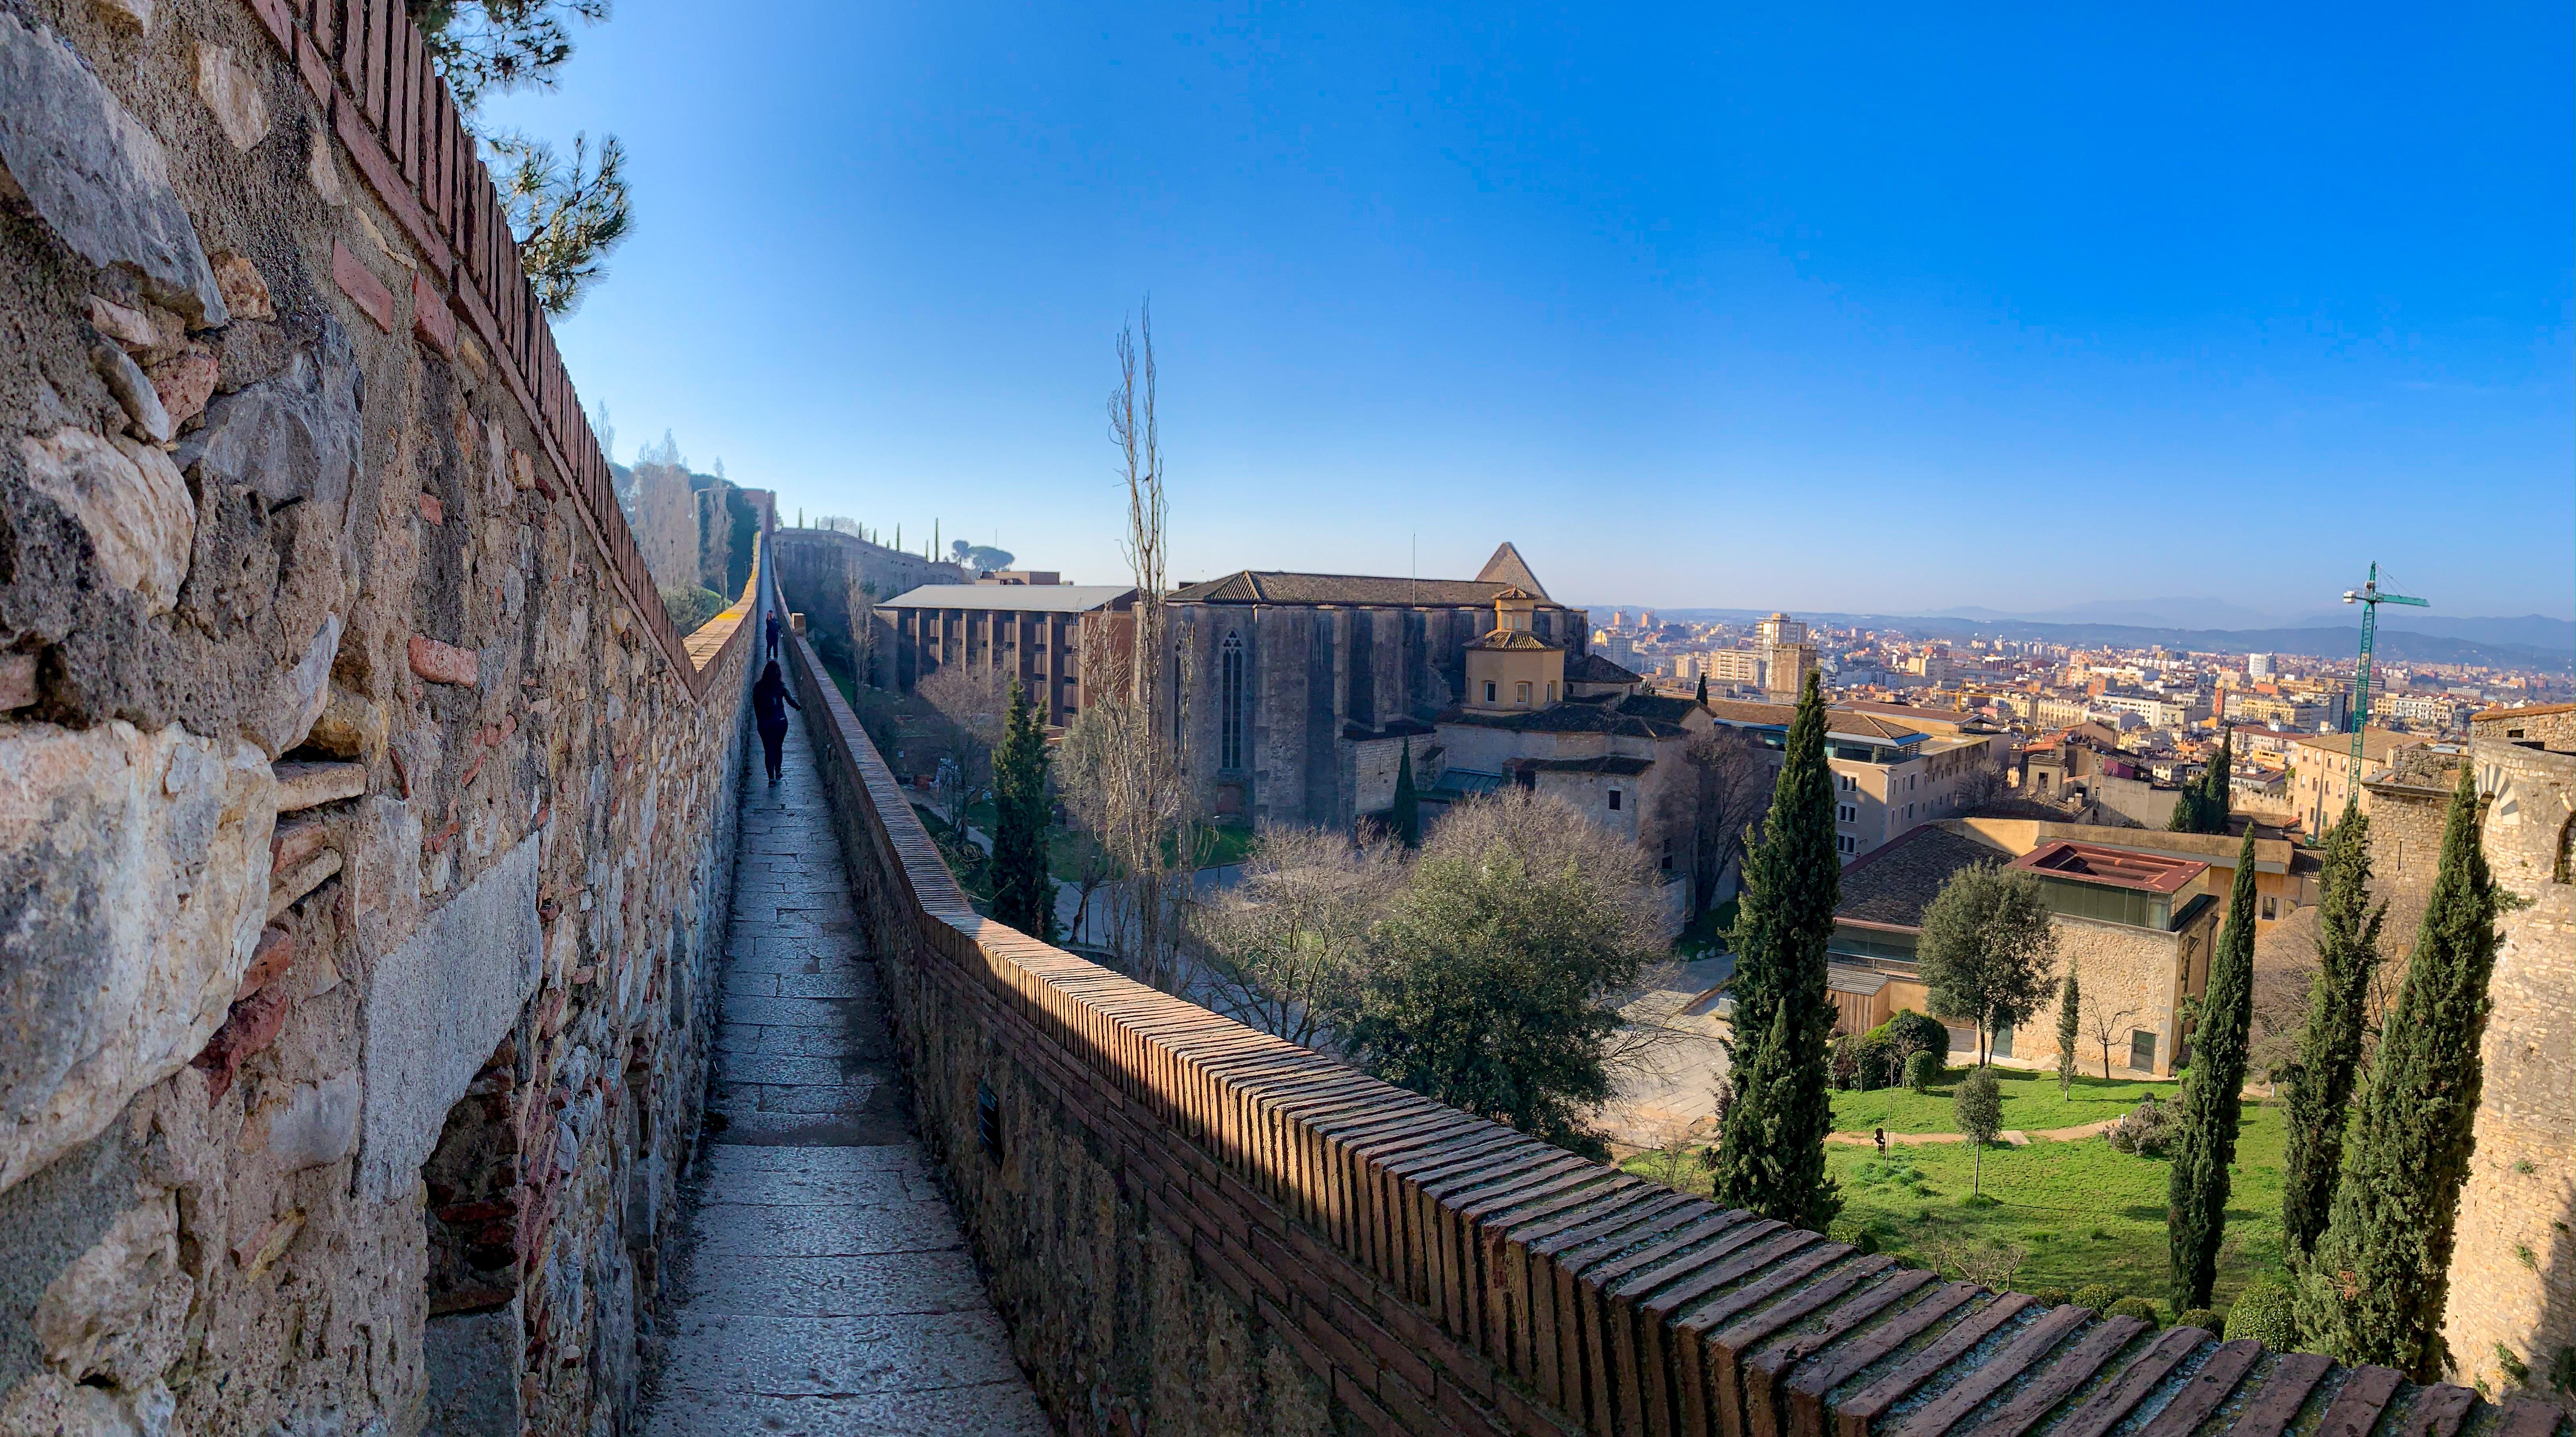 Girona: One Historic Day in Catalonia, Spain | Day Trips from Barcelona | A Great Big Hunk of World | www.agreatbighunkofworld.com |  Passeig de la Muralla | Girona City Walls